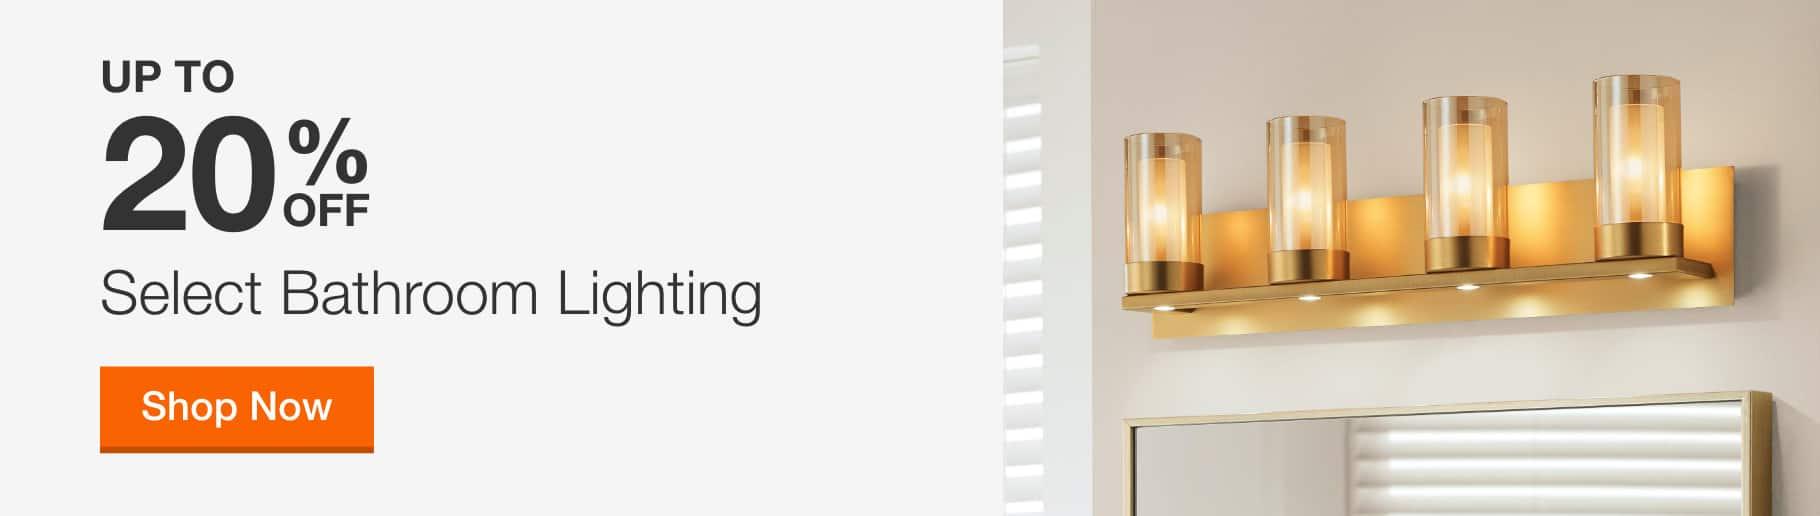 Up to 20% off Select Bathroom Lighting